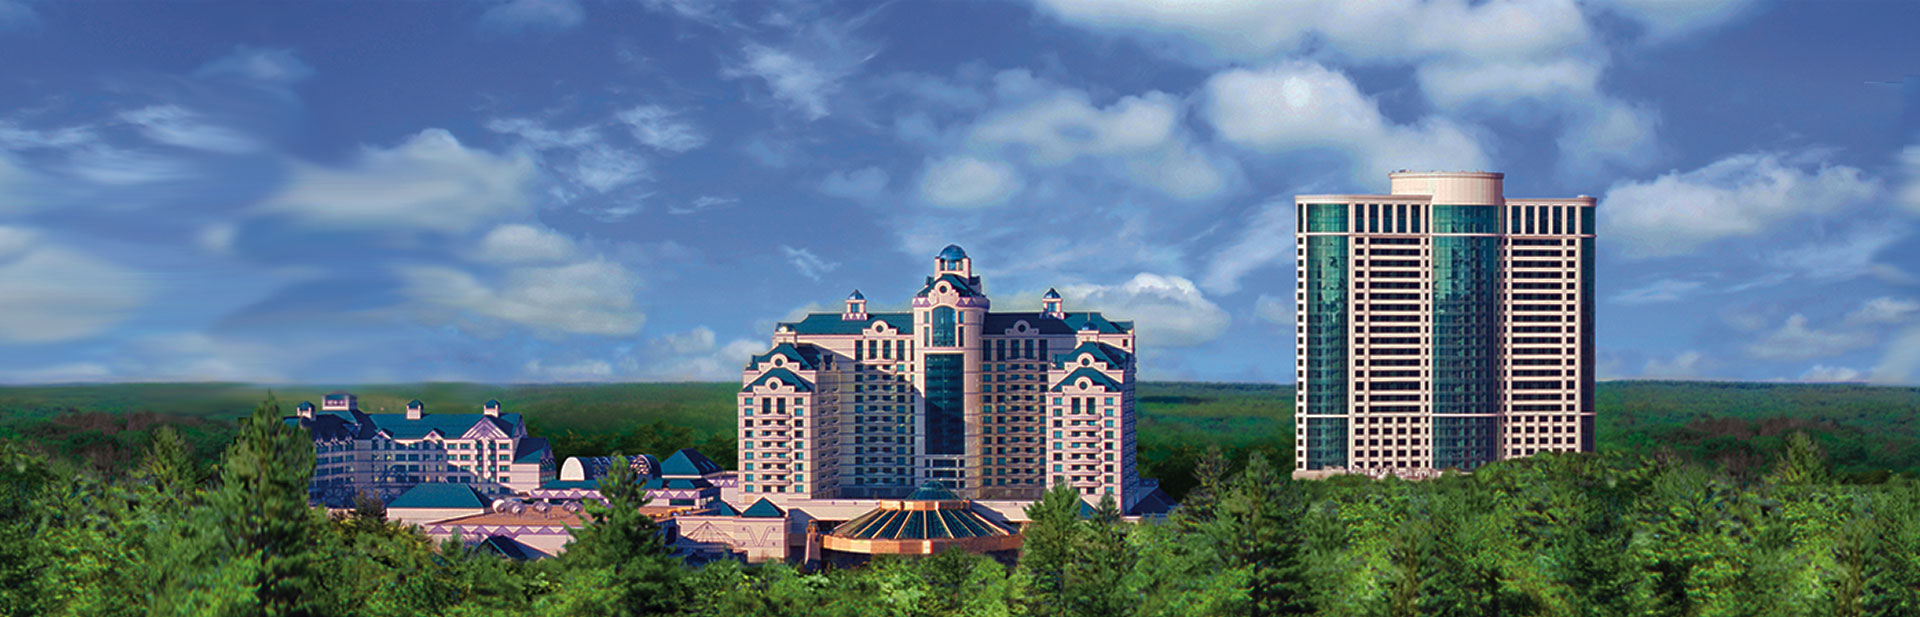 casino in connecticut foxwood